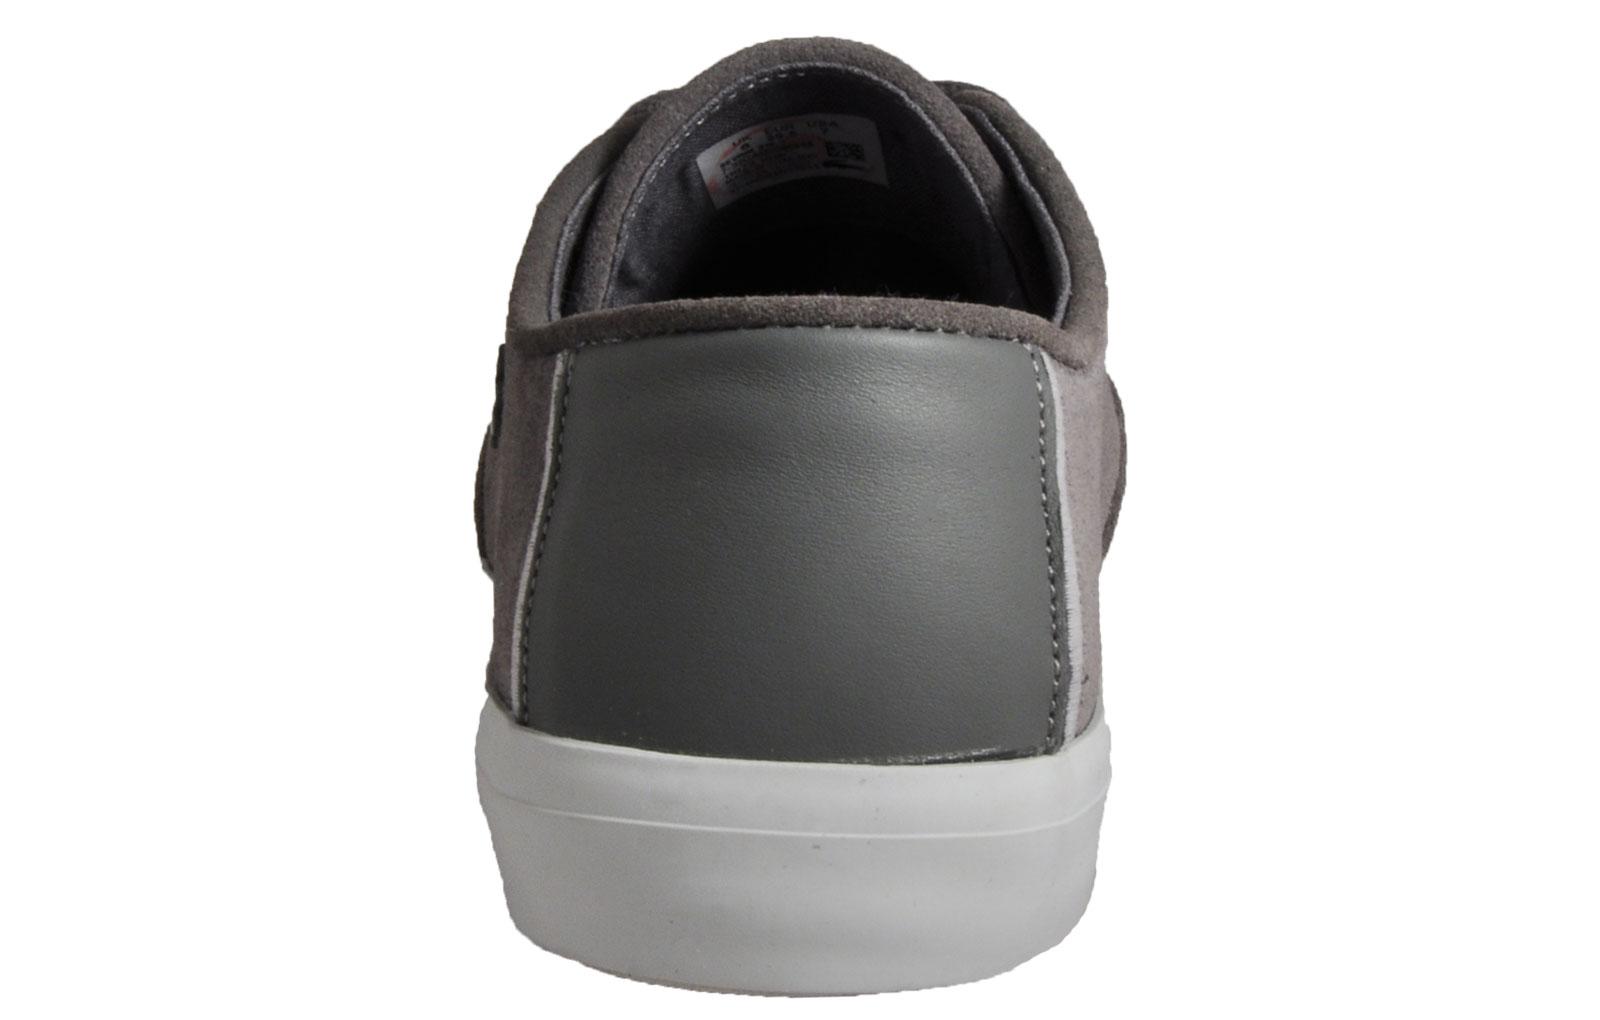 21f639eb1 Lacoste Sevrin 316 Men s Classic Designer Suede Leather Boat Deck Shoes B  Grade